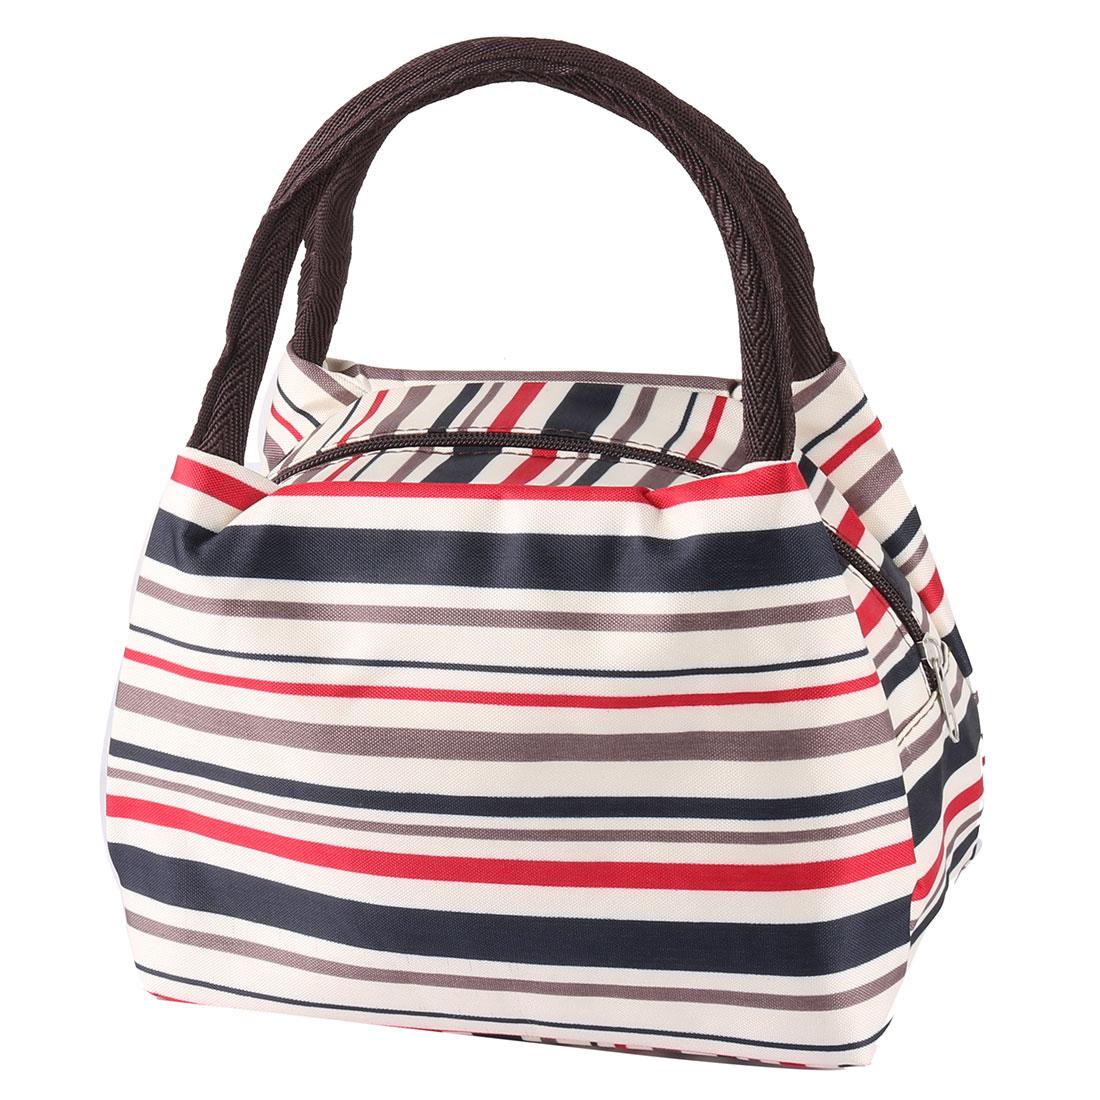 Household Linen Cotton Stripe Pattern Lunch Holder Cooler Pouch Handbag Bag